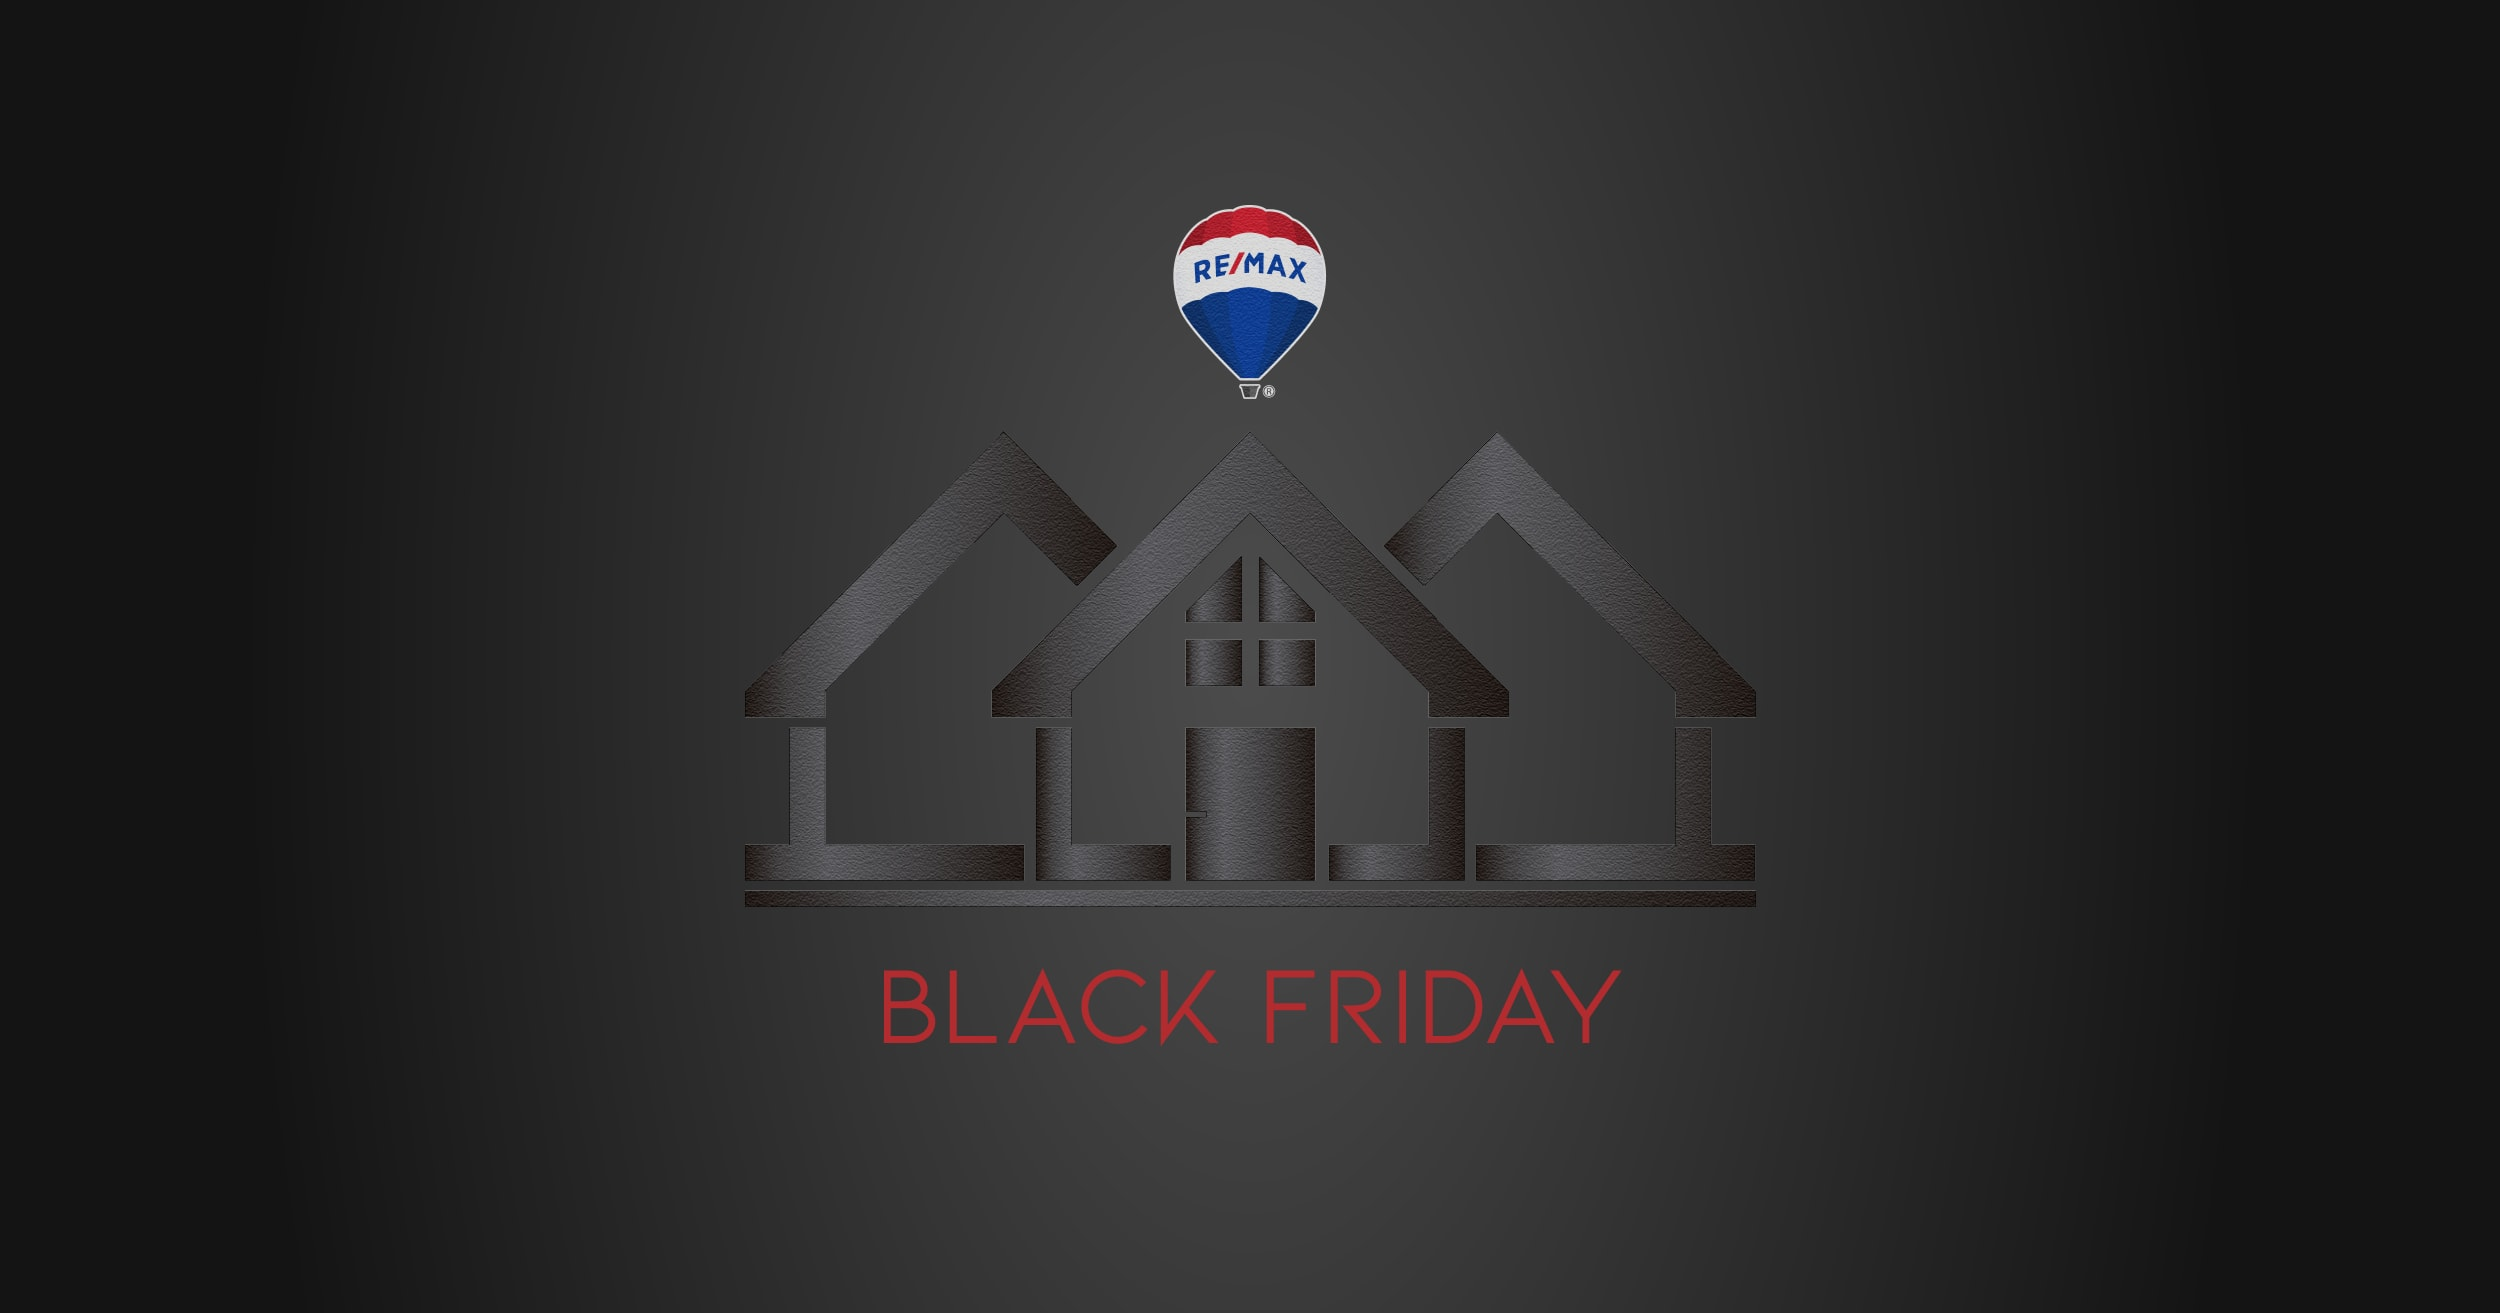 Black Friday Nh Real Estate Deals